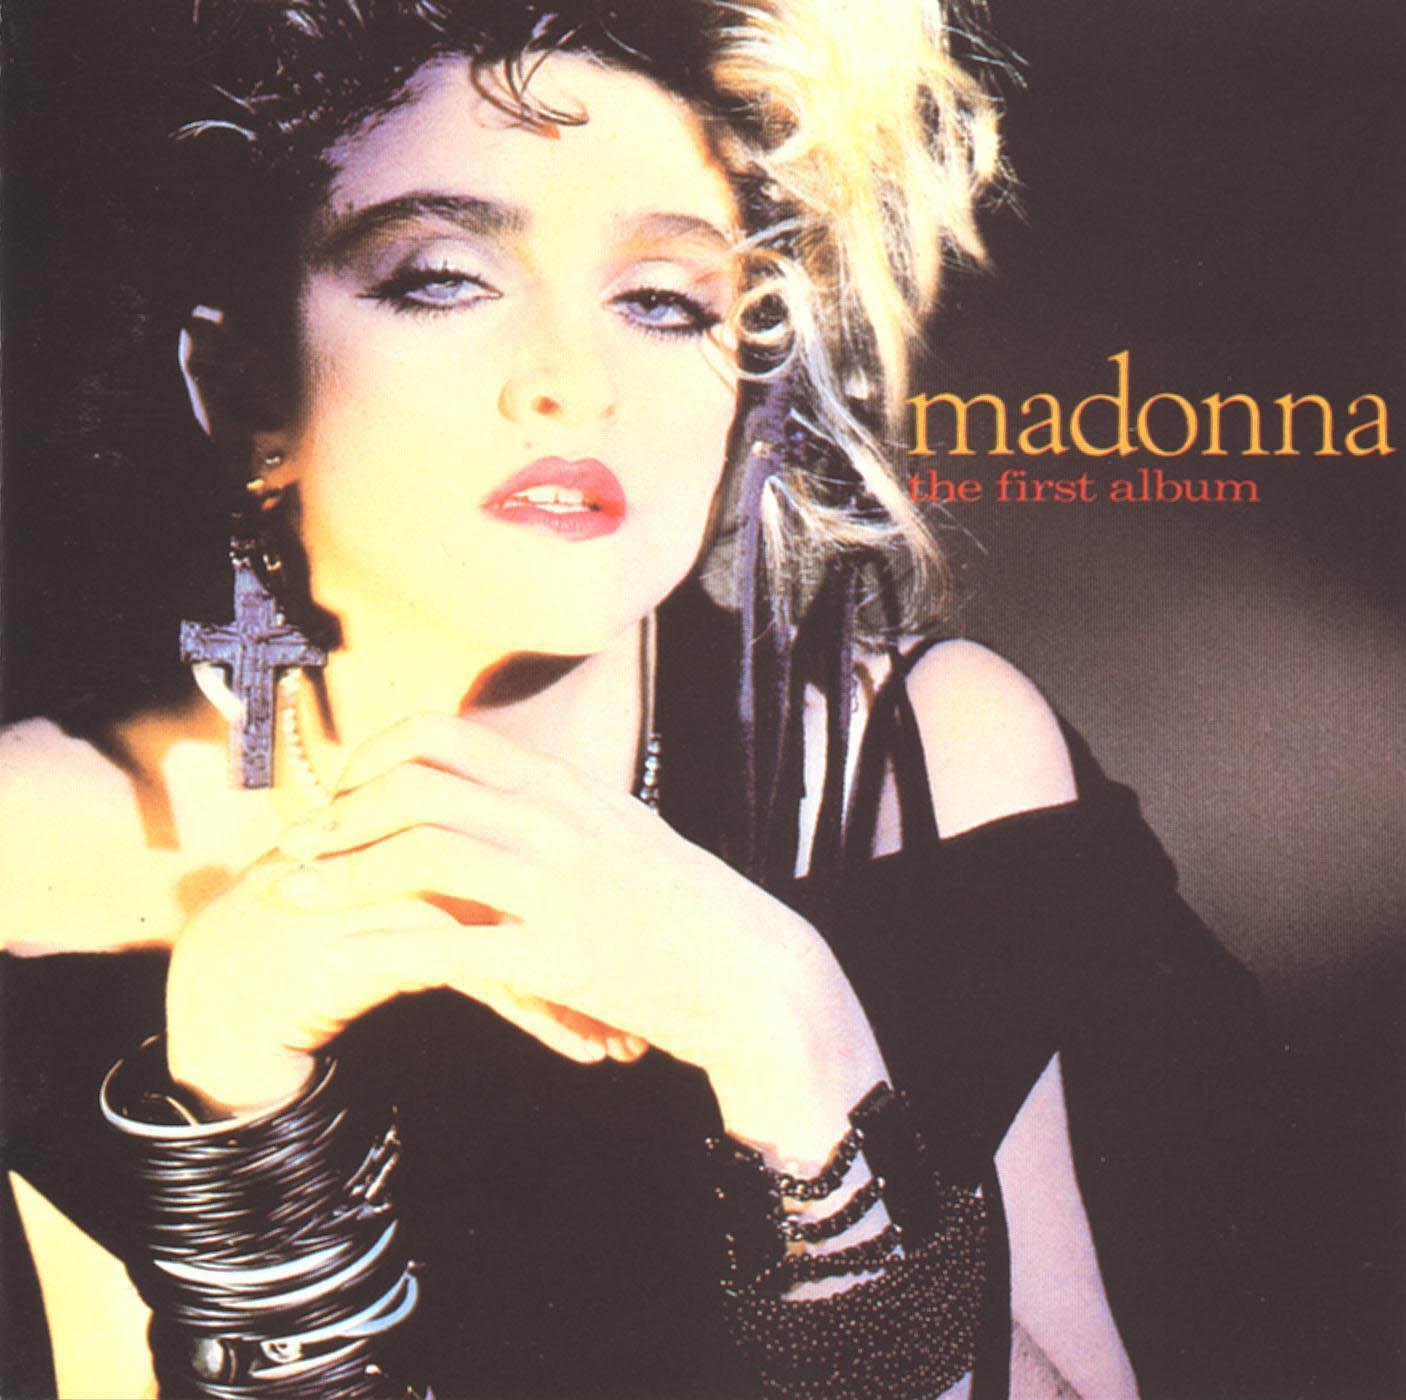 http://3.bp.blogspot.com/-mV1RizsyR1o/UIV2QzUX9AI/AAAAAAAACNE/96toA9eDD3M/s1600/Madonna-The_First_Album-Frontal.jpg